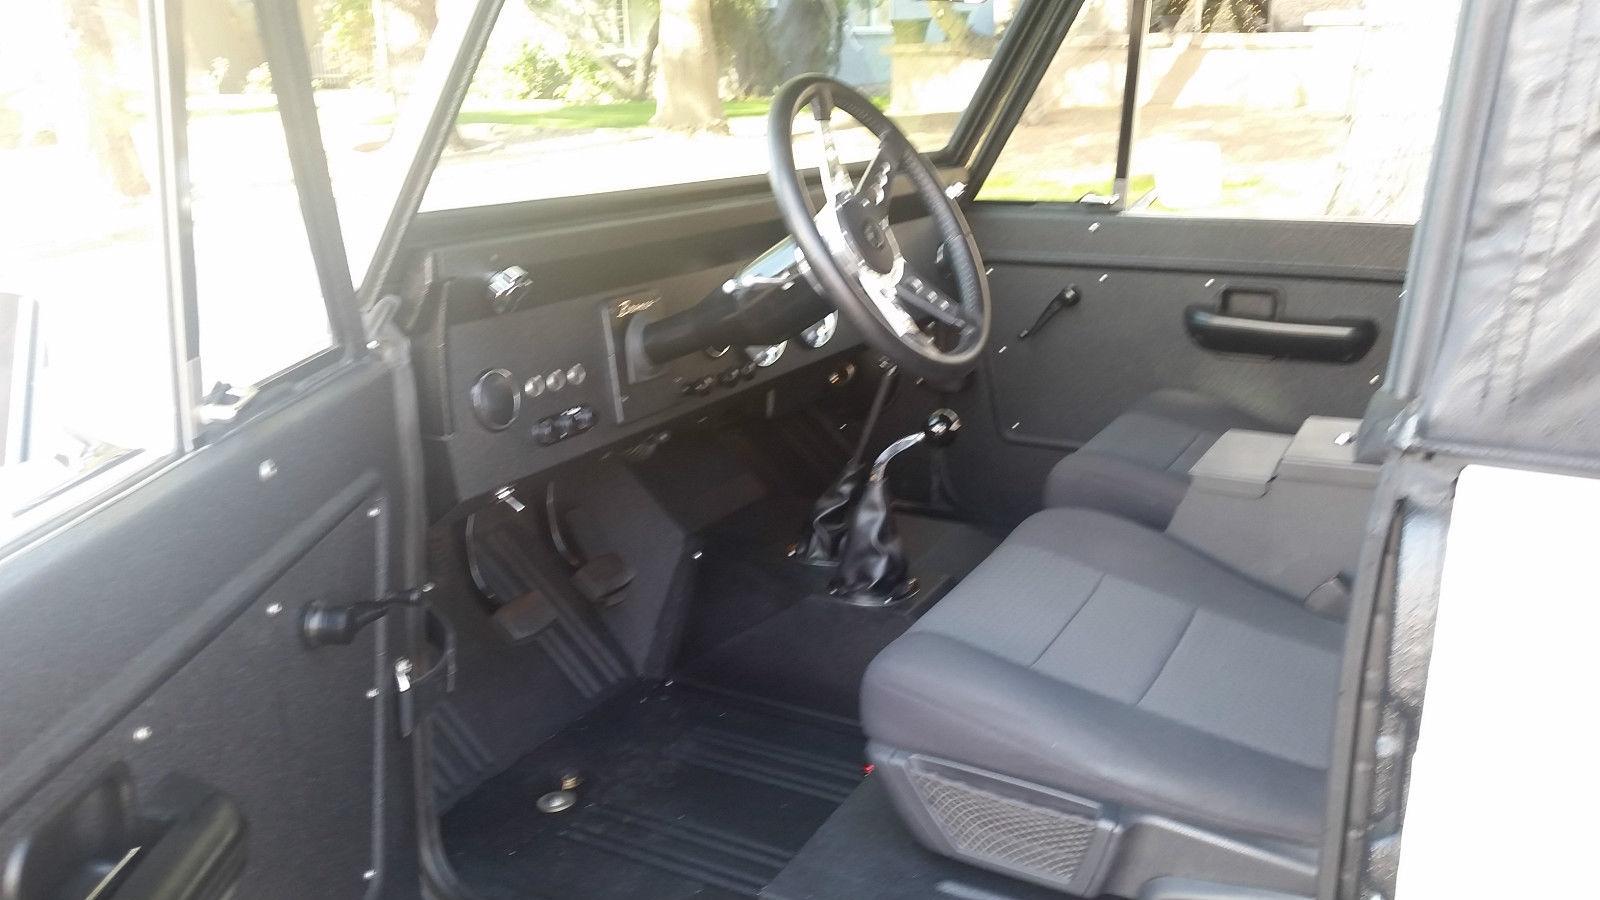 1971 71 Early Ford Bronco Frame Off Restoration Custom Hot Rod V8 3 Interior Speed